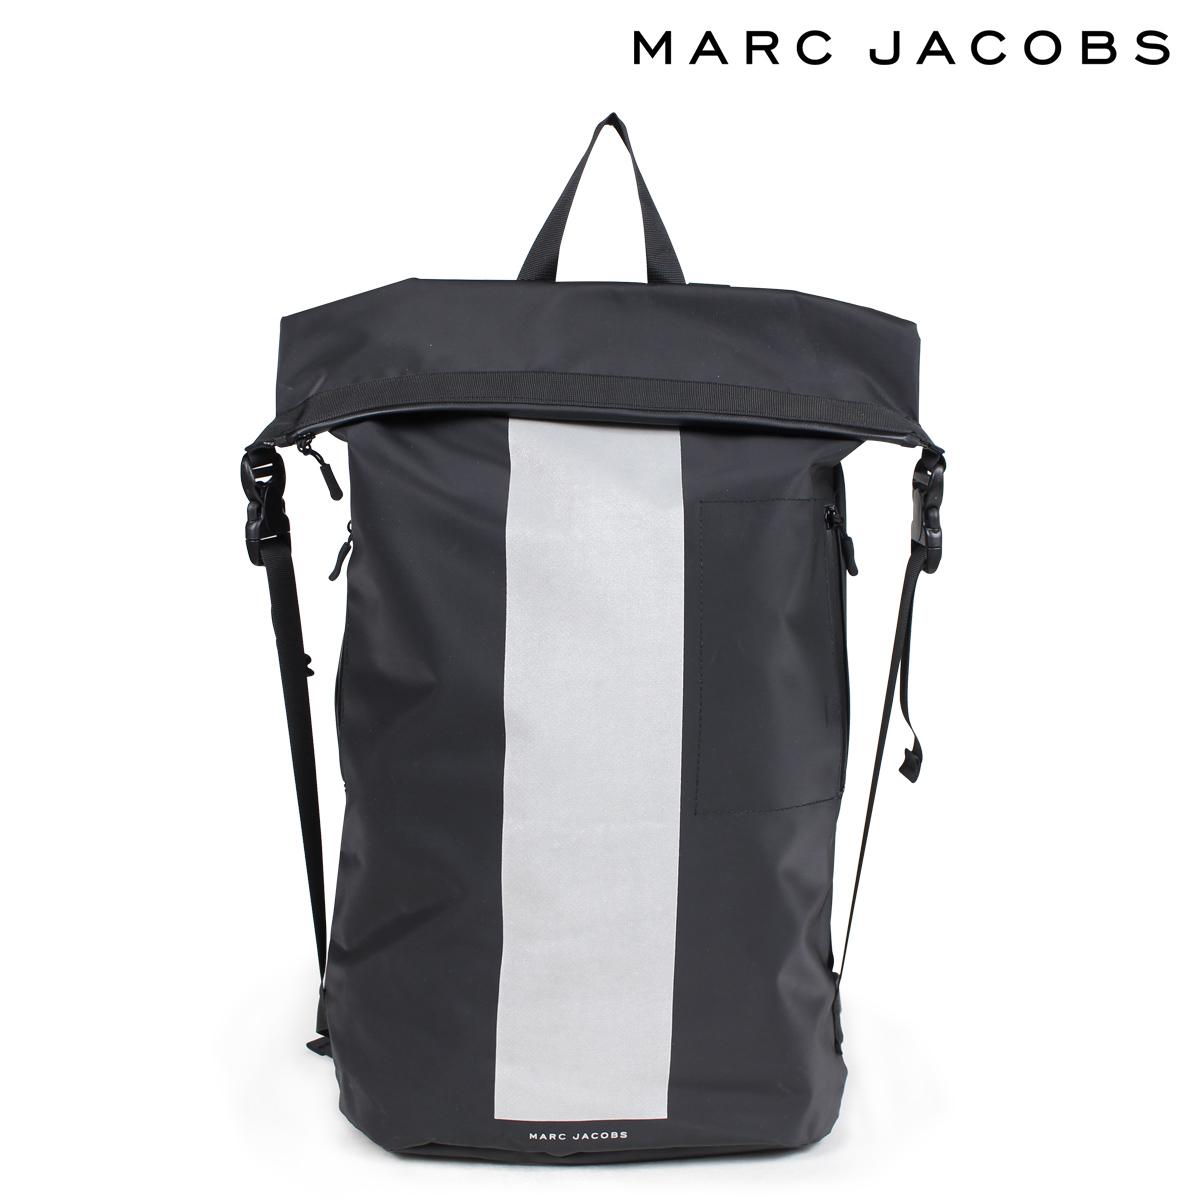 MARC JACOBS LOGO BACKPAC マークジェイコブス リュック バッグ バックパック レディース メンズ ブラック 黒 M7000233